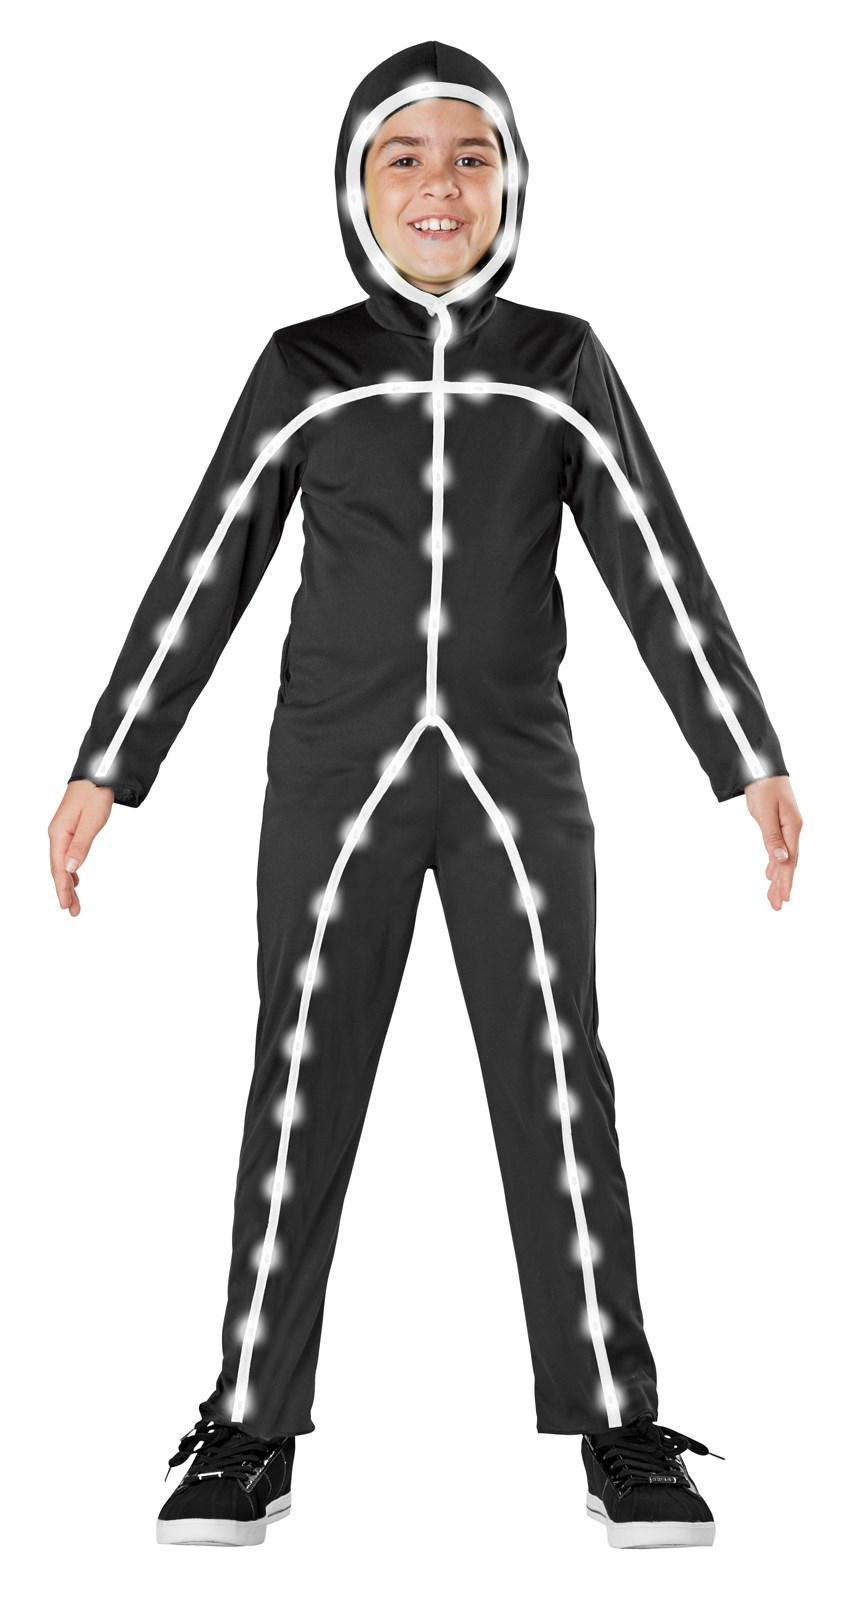 Light Up Stick Man Costume For Kids